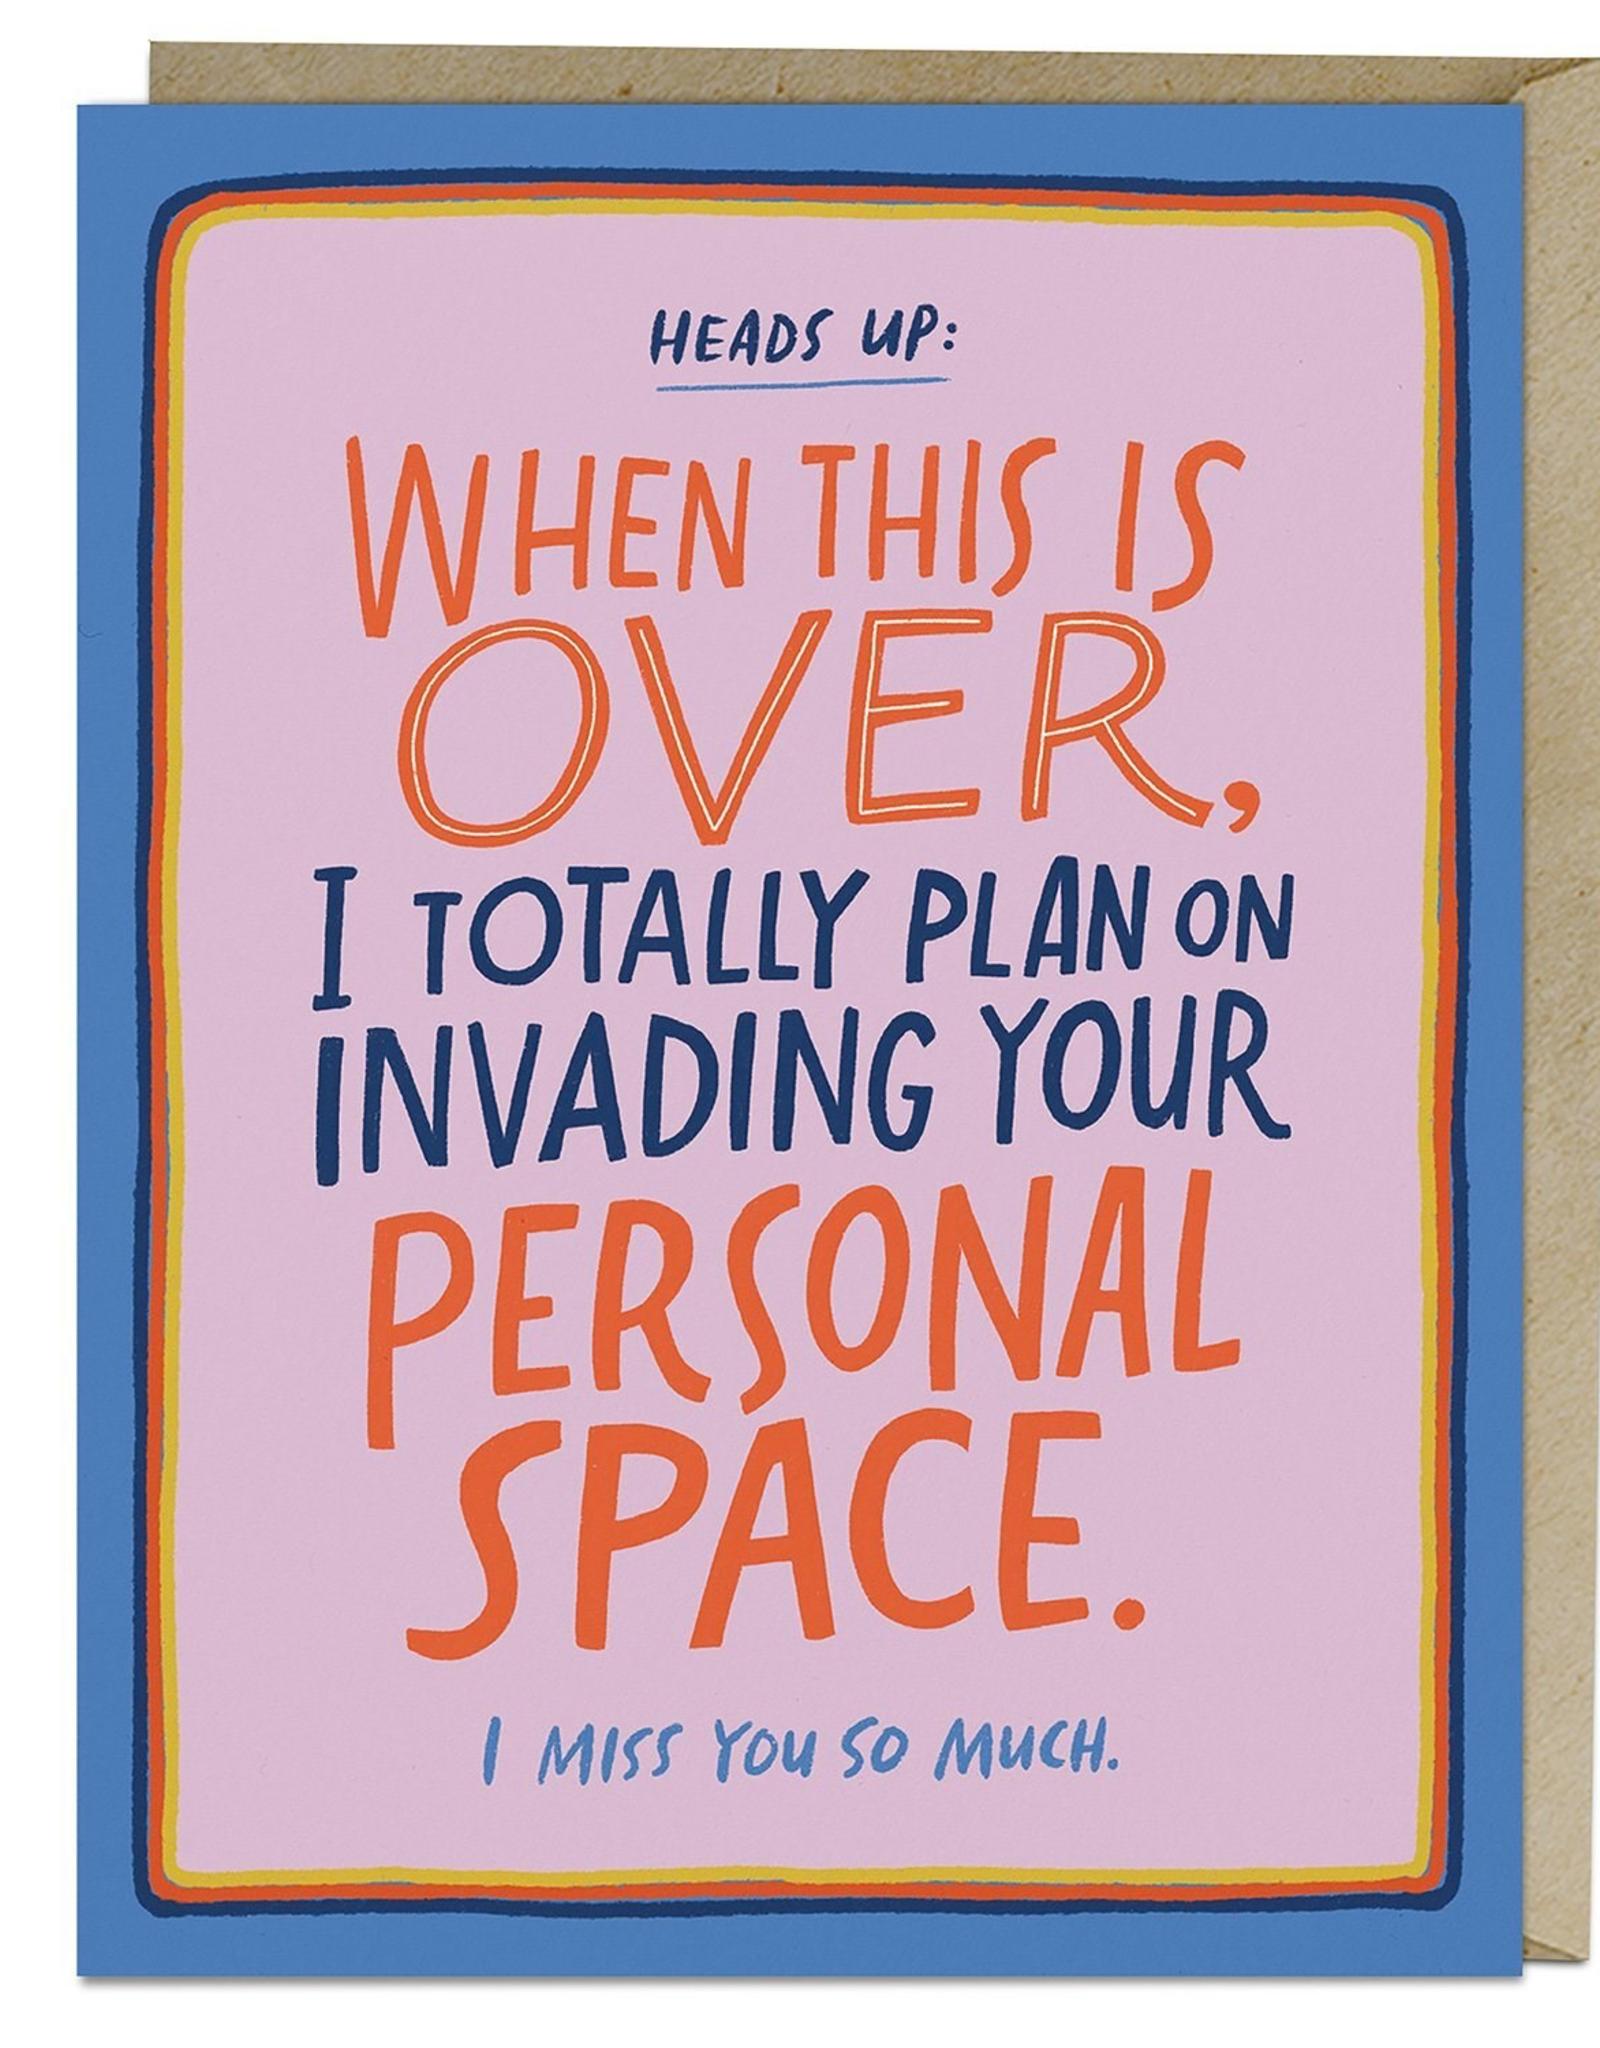 Paper E Clips Paper E Clips Personal Space Card-2839